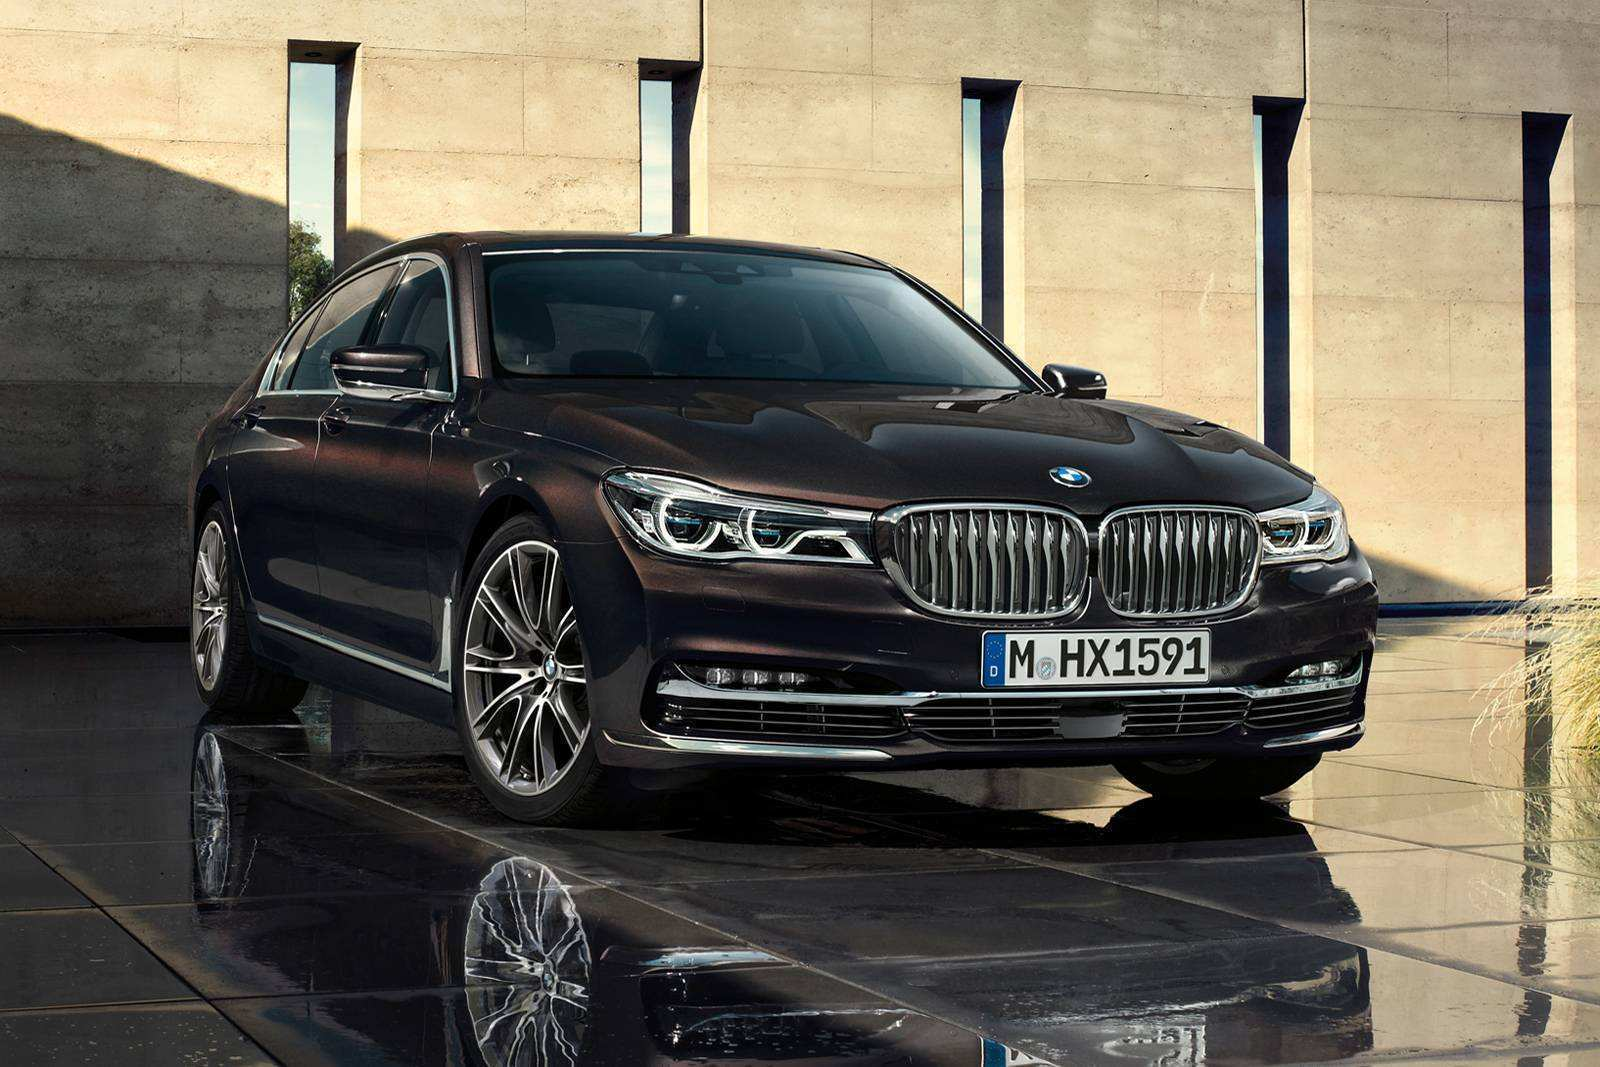 96 Gallery of 2020 BMW 750Li Xdrive Specs and Review with 2020 BMW 750Li Xdrive